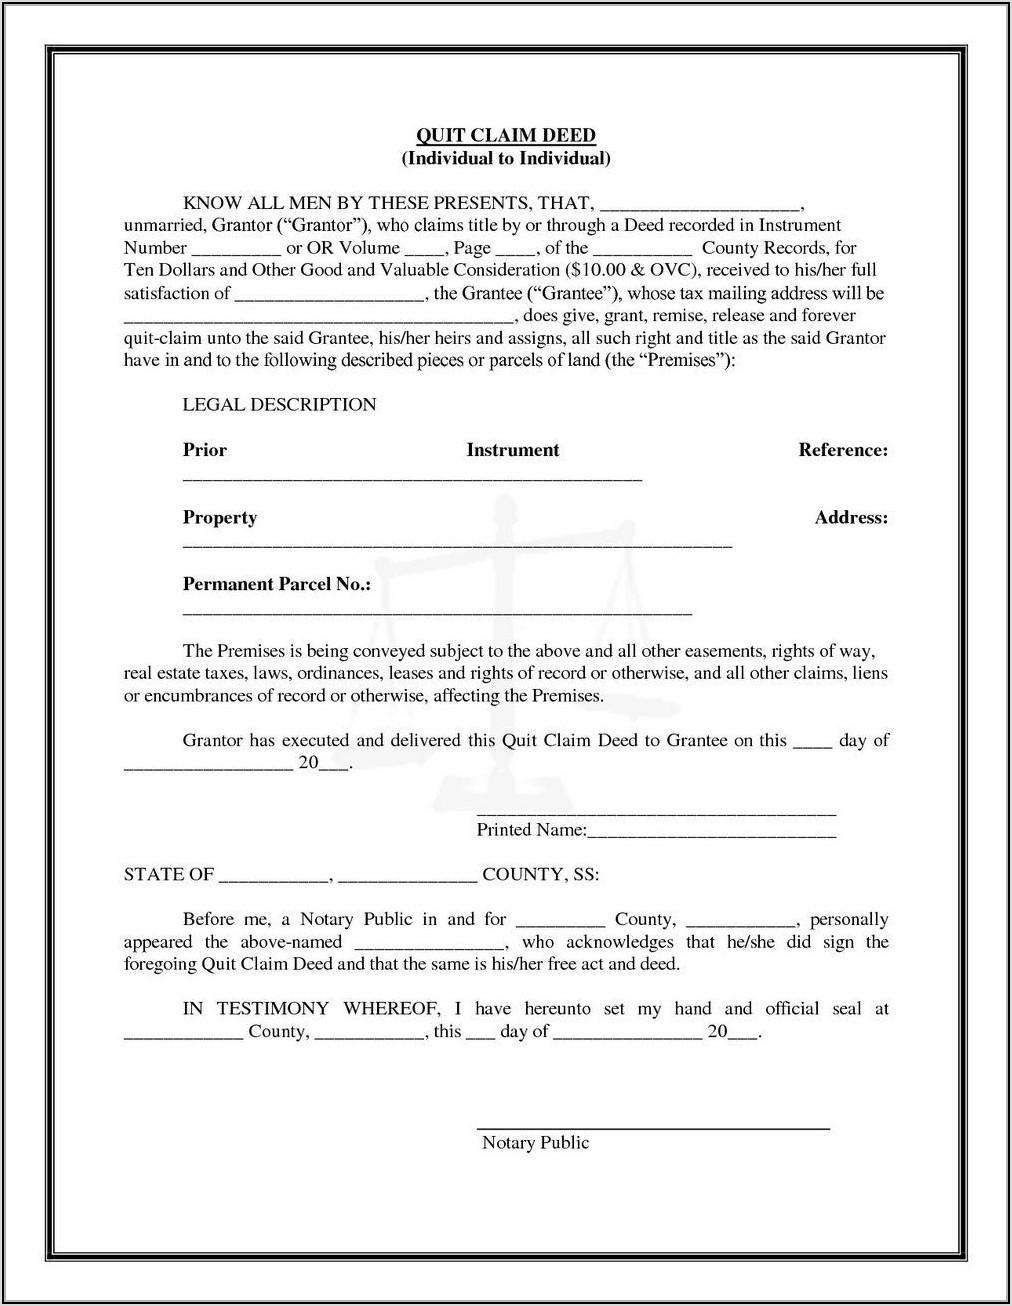 Quit Claim Deed Form Florida Pdf